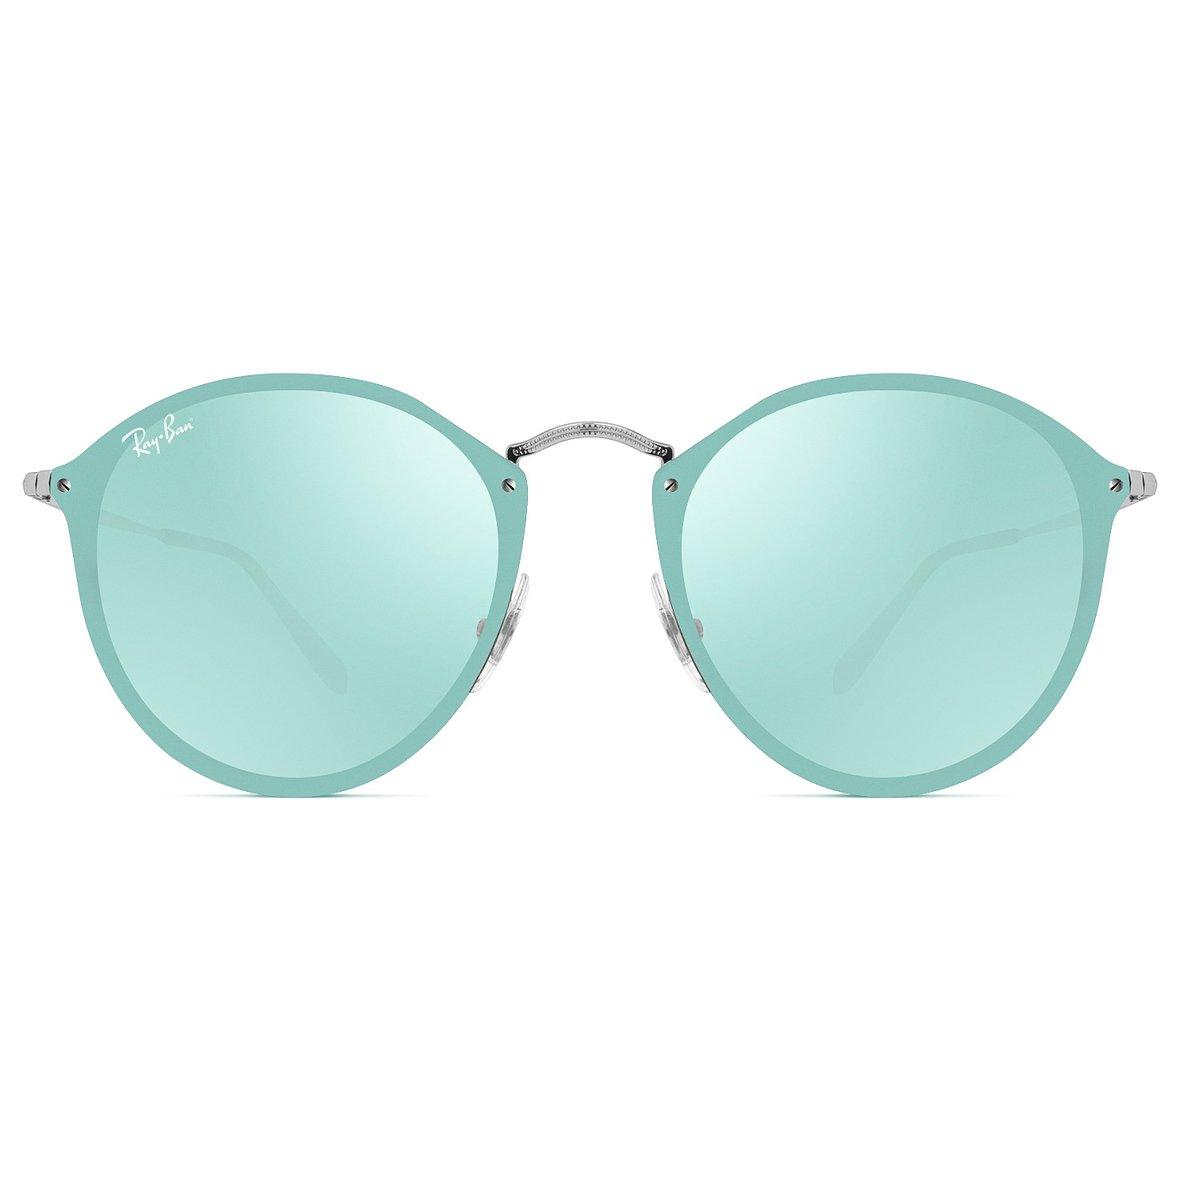 bf03ee897 Óculos de Sol Ray Ban Blaze Round RB3574N 003/30-59 | Zattini